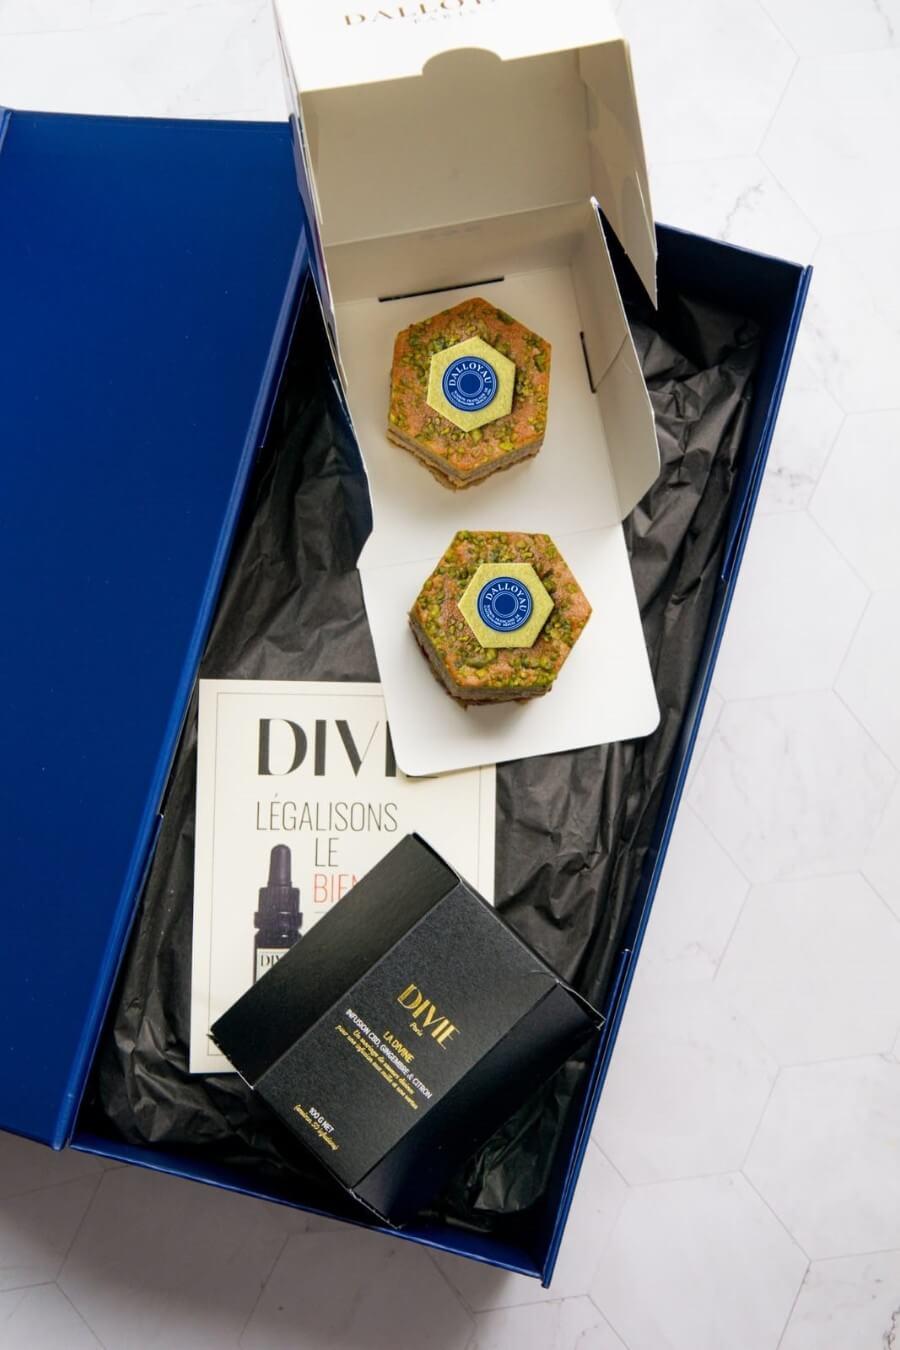 BOX DUO DIVIE X DALLOYAU